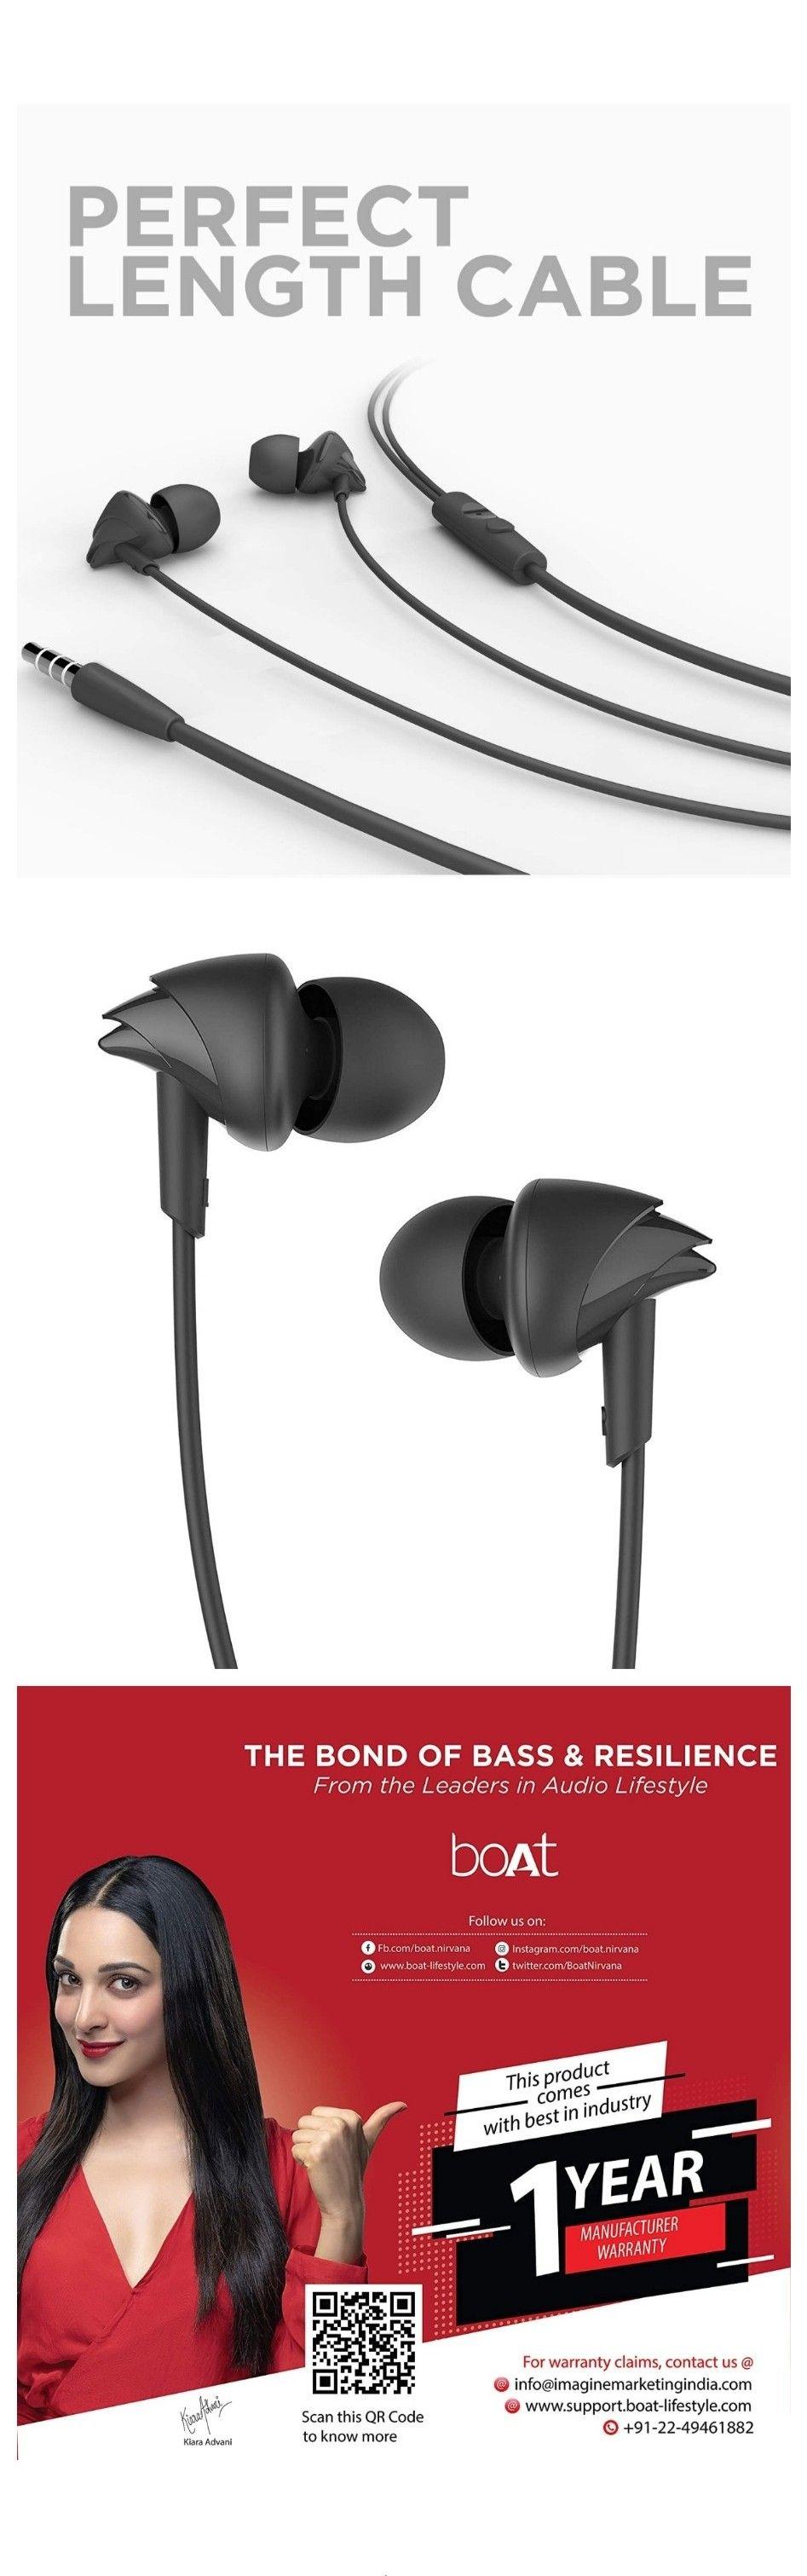 65 Off On Boat Wired Earphones In 2020 Boat Wiring Black Headphones Bass Head